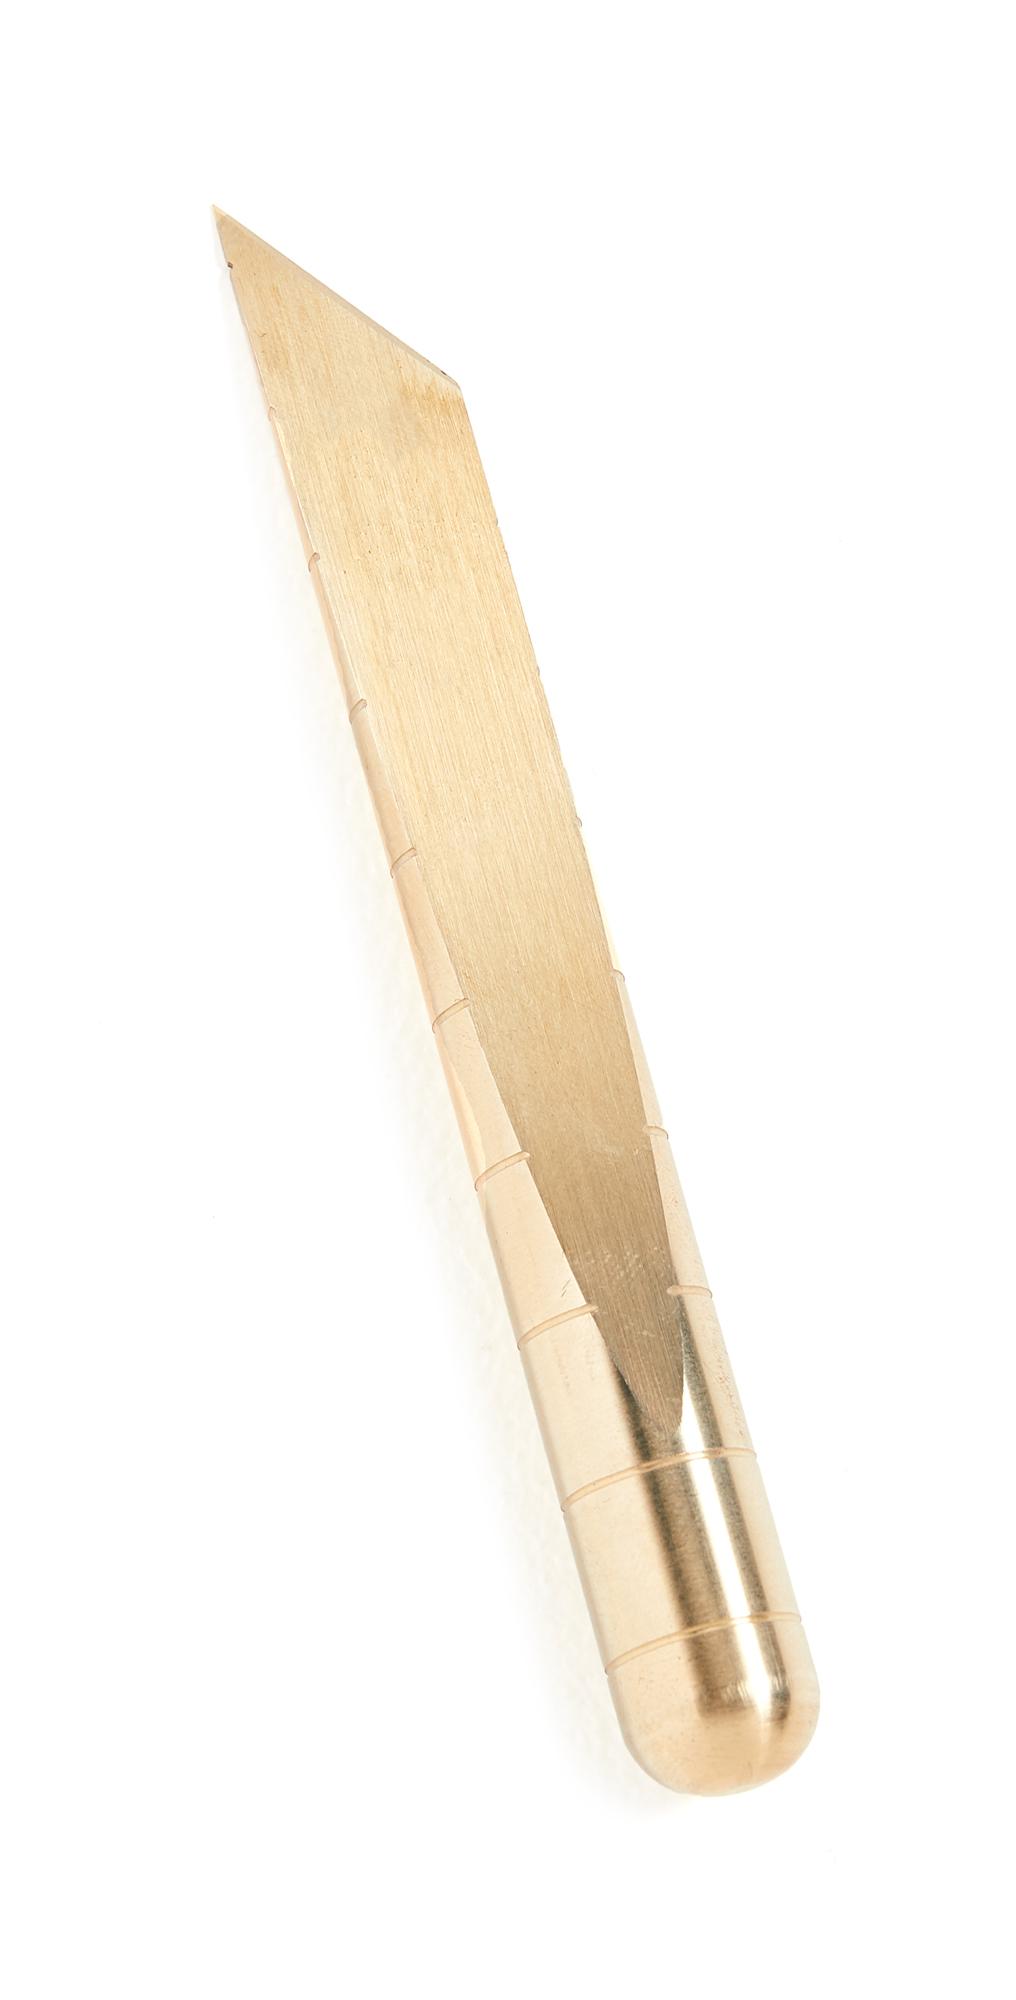 Craighill Desk Knife